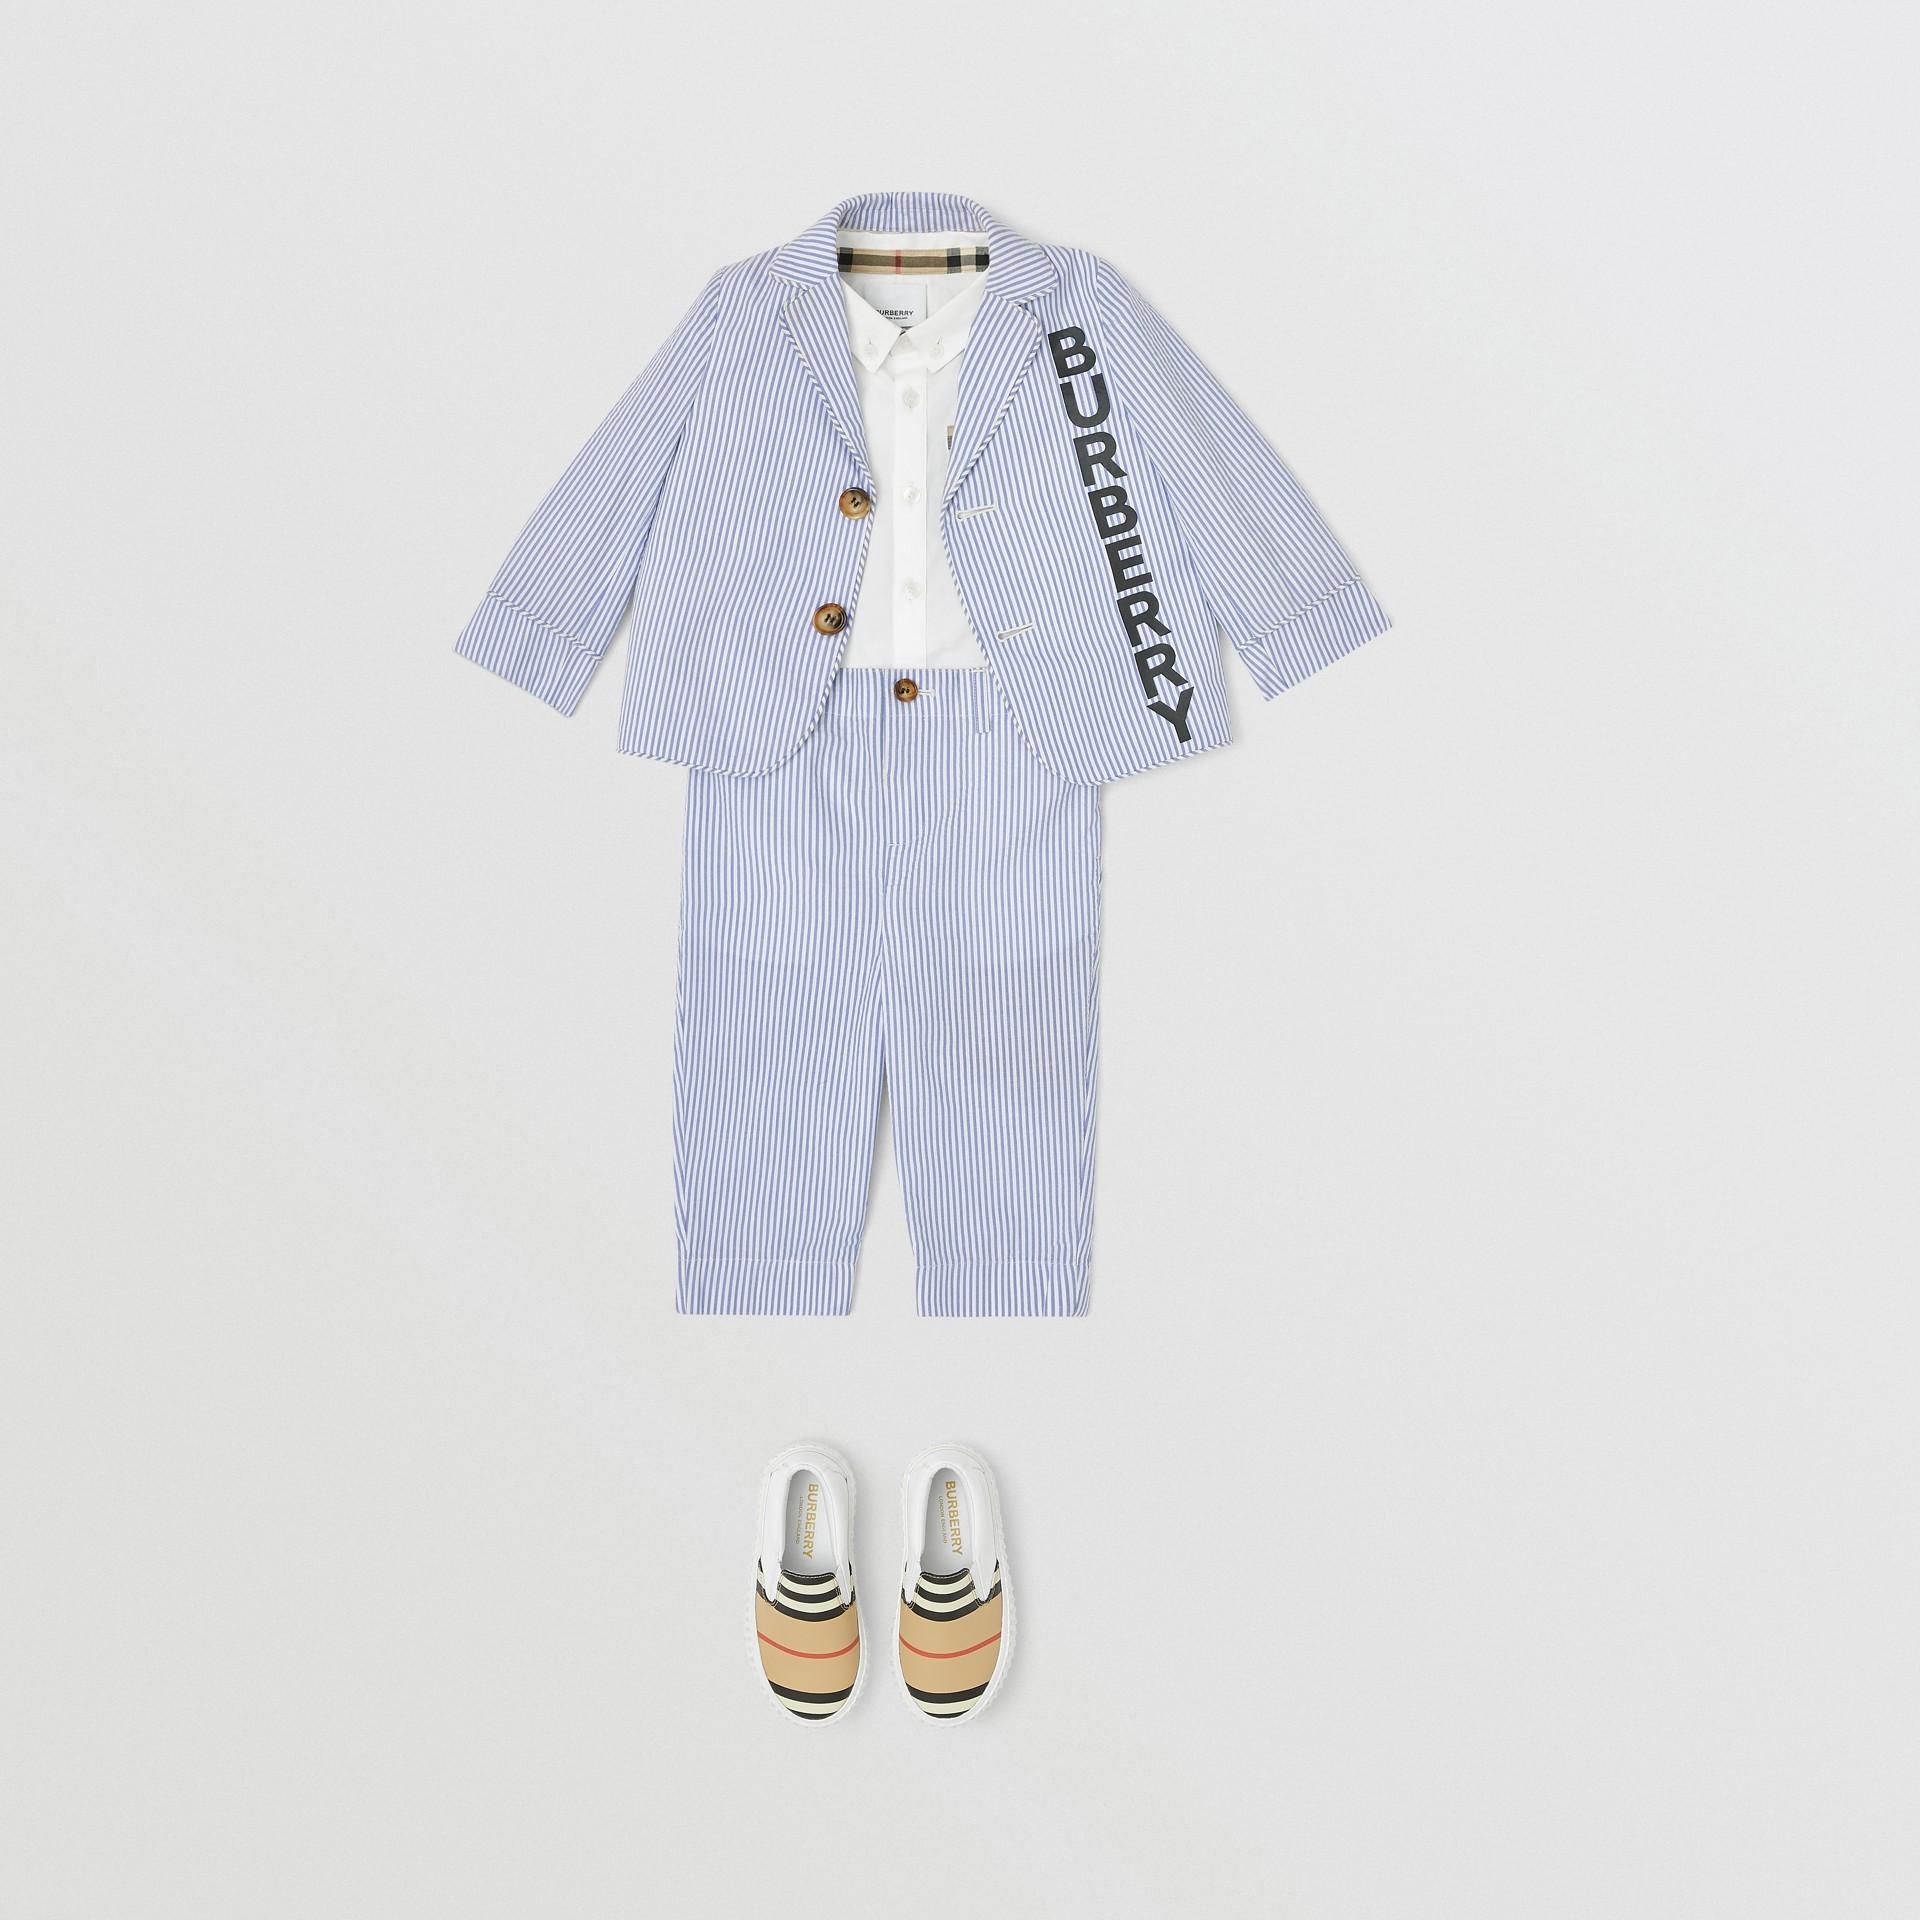 Striped Cotton Seersucker Tailored Trousers in Cornflower Blue - Children | Burberry - gallery image 2